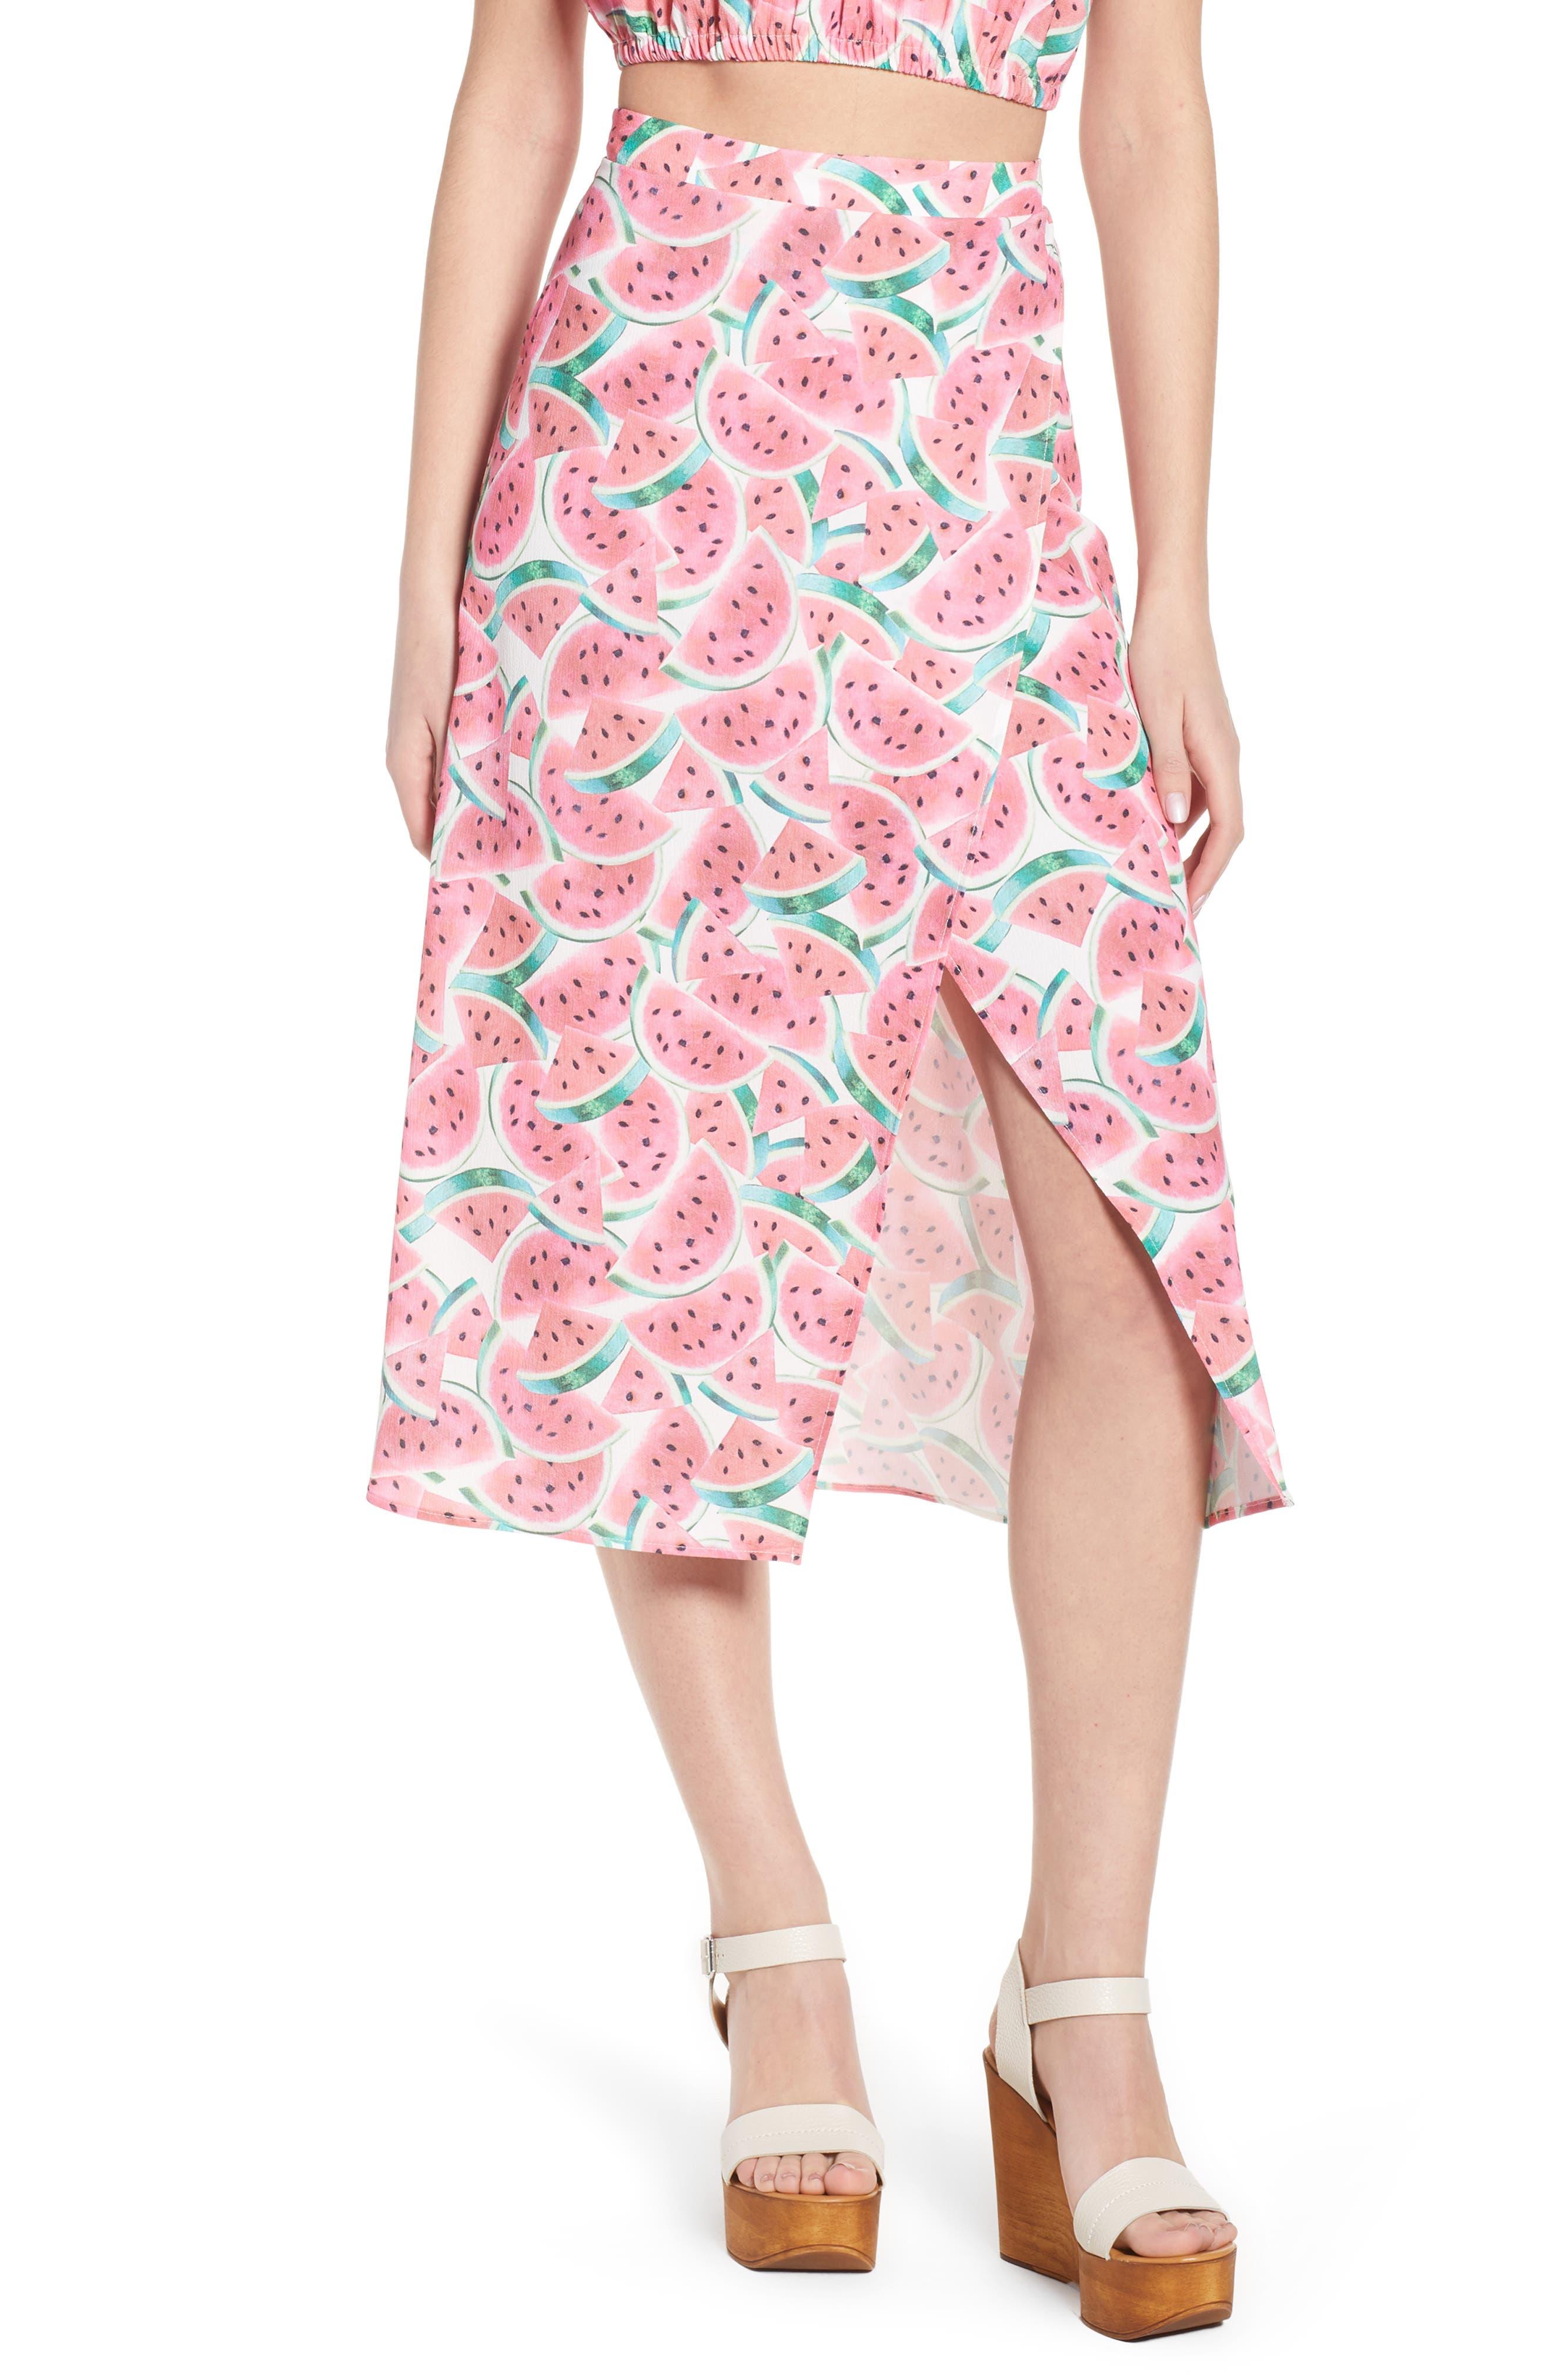 Flirt Midi Skirt,                             Main thumbnail 1, color,                             One In A Melon Crinkle Stretch